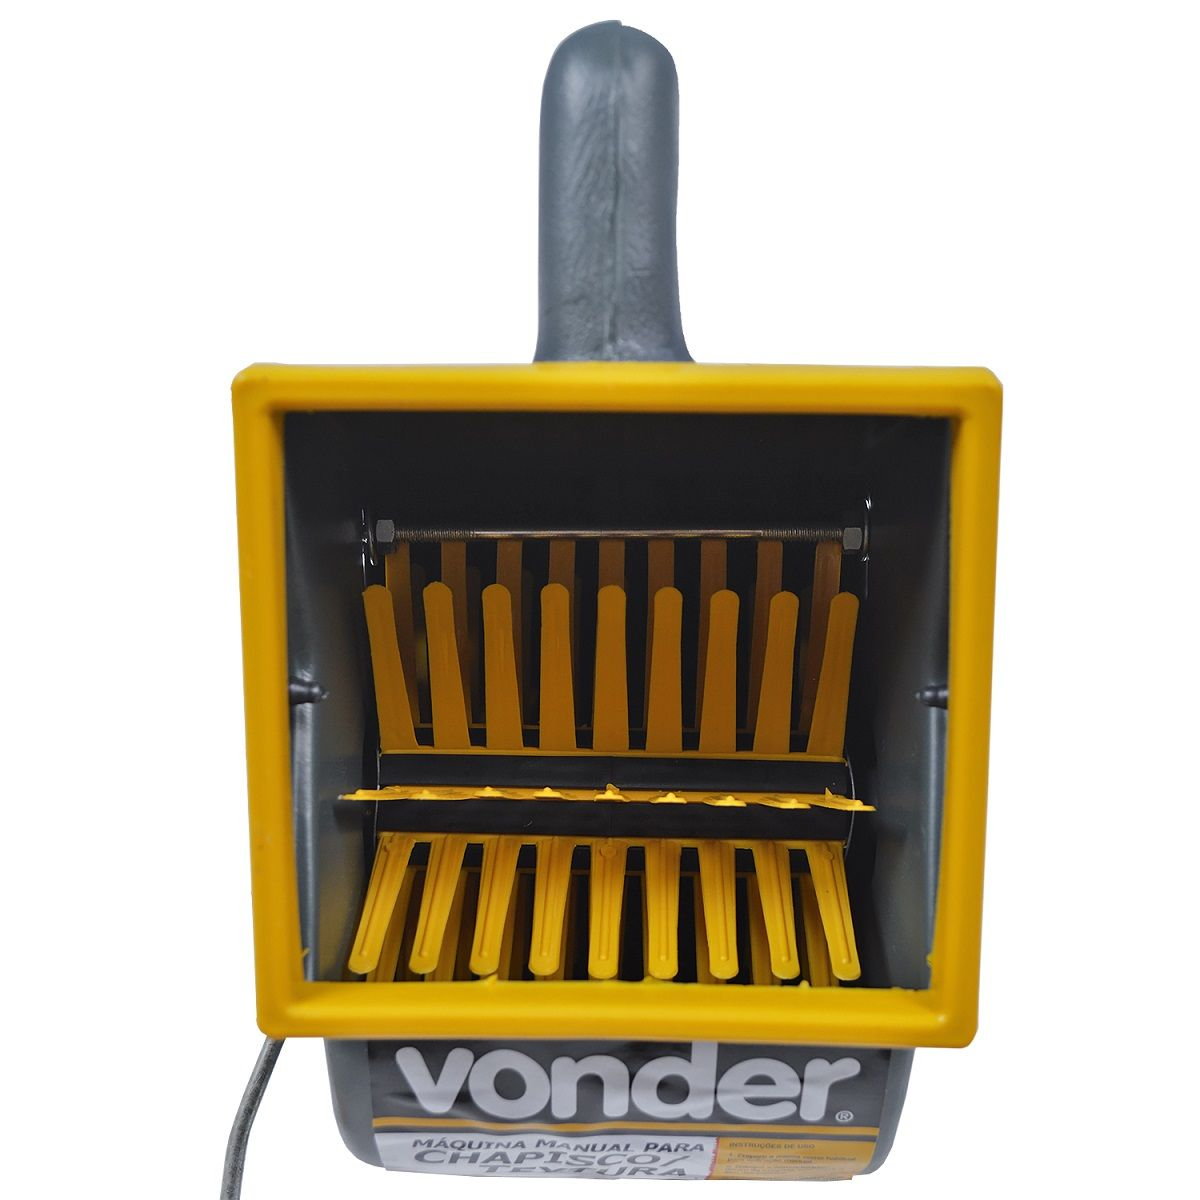 Aplicador Manual de Chapisco Textura Vonder